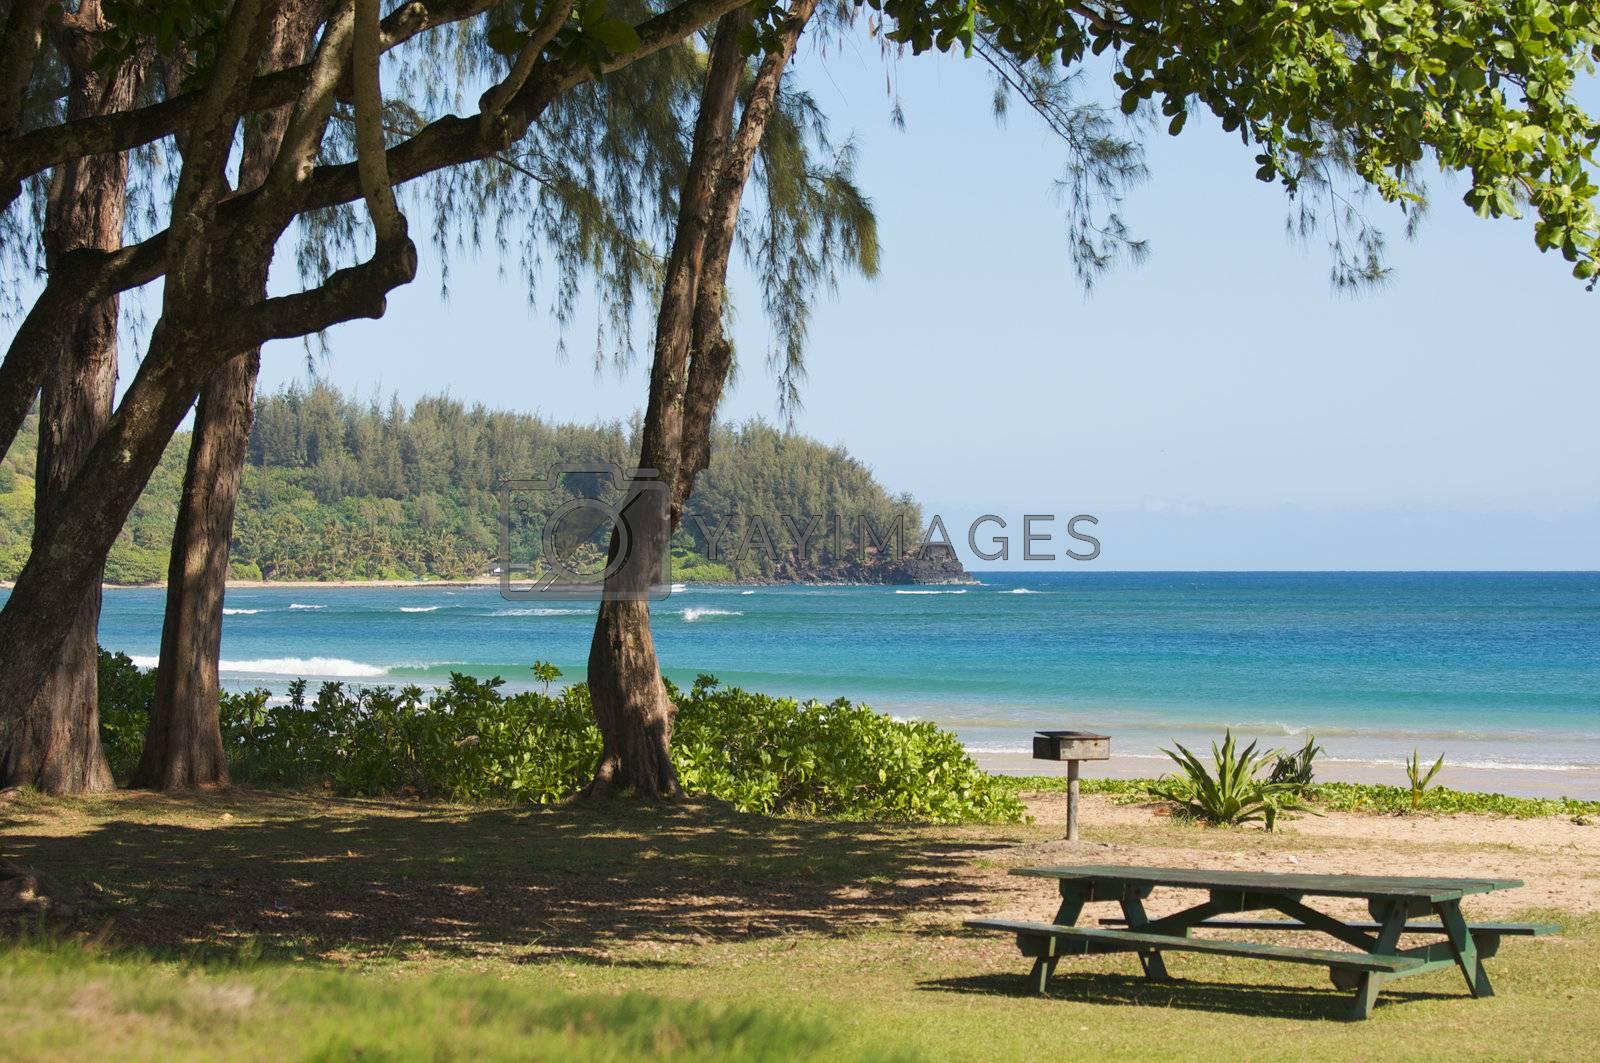 Inviting Tropical Park - Halalei Bay, Kauai, Hawaii